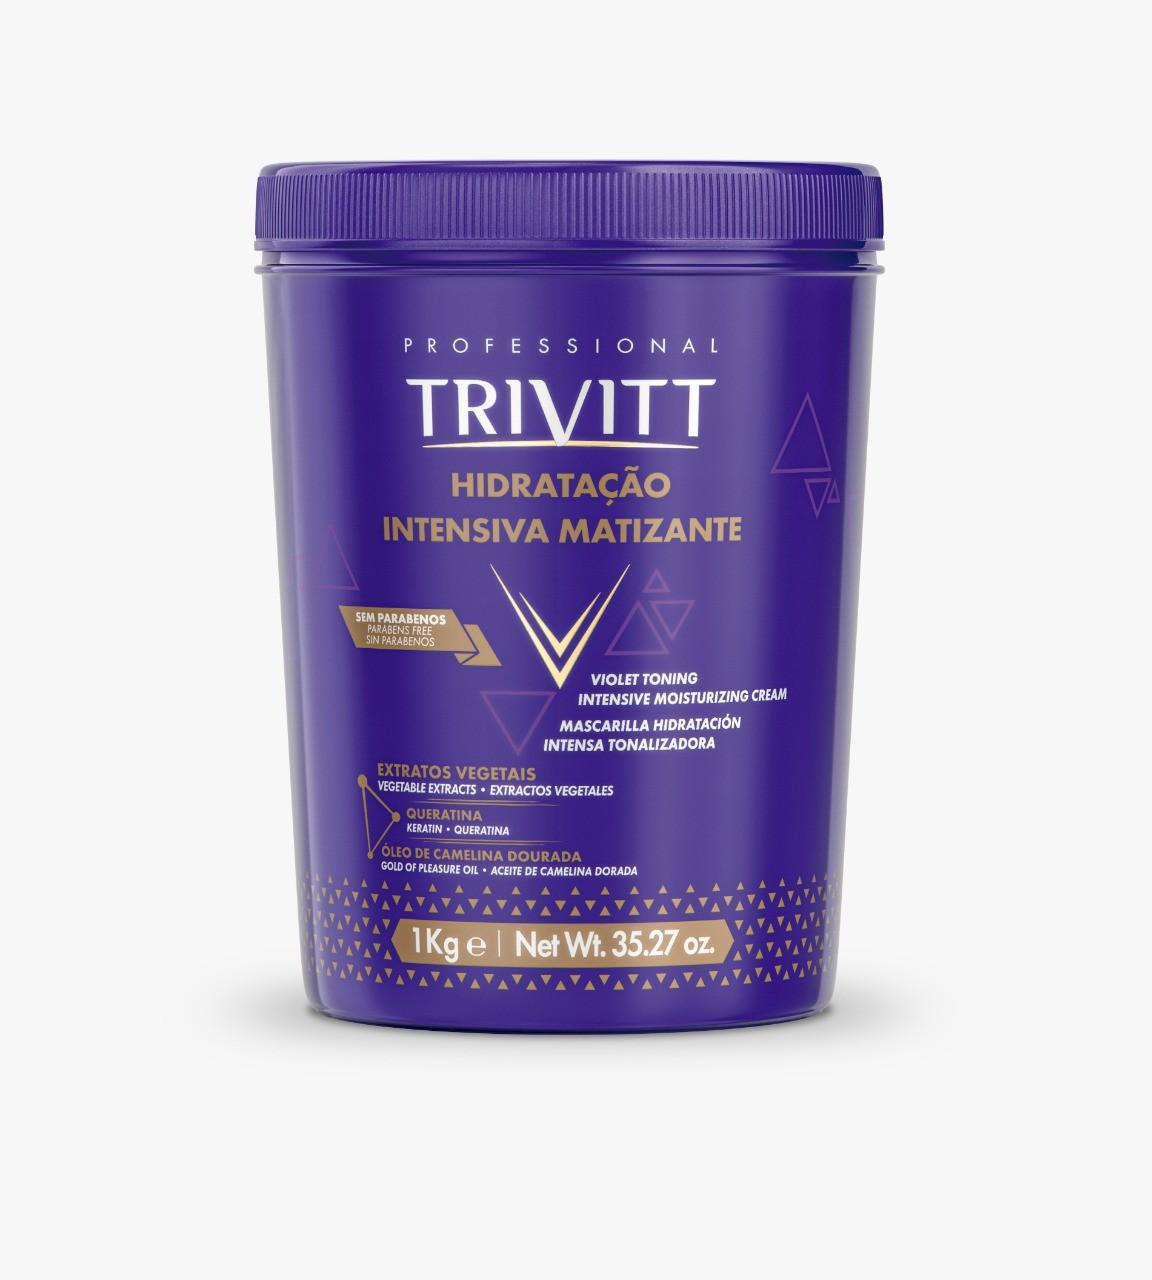 Hidratação Intensiva Matizante - Trivitt 1KG